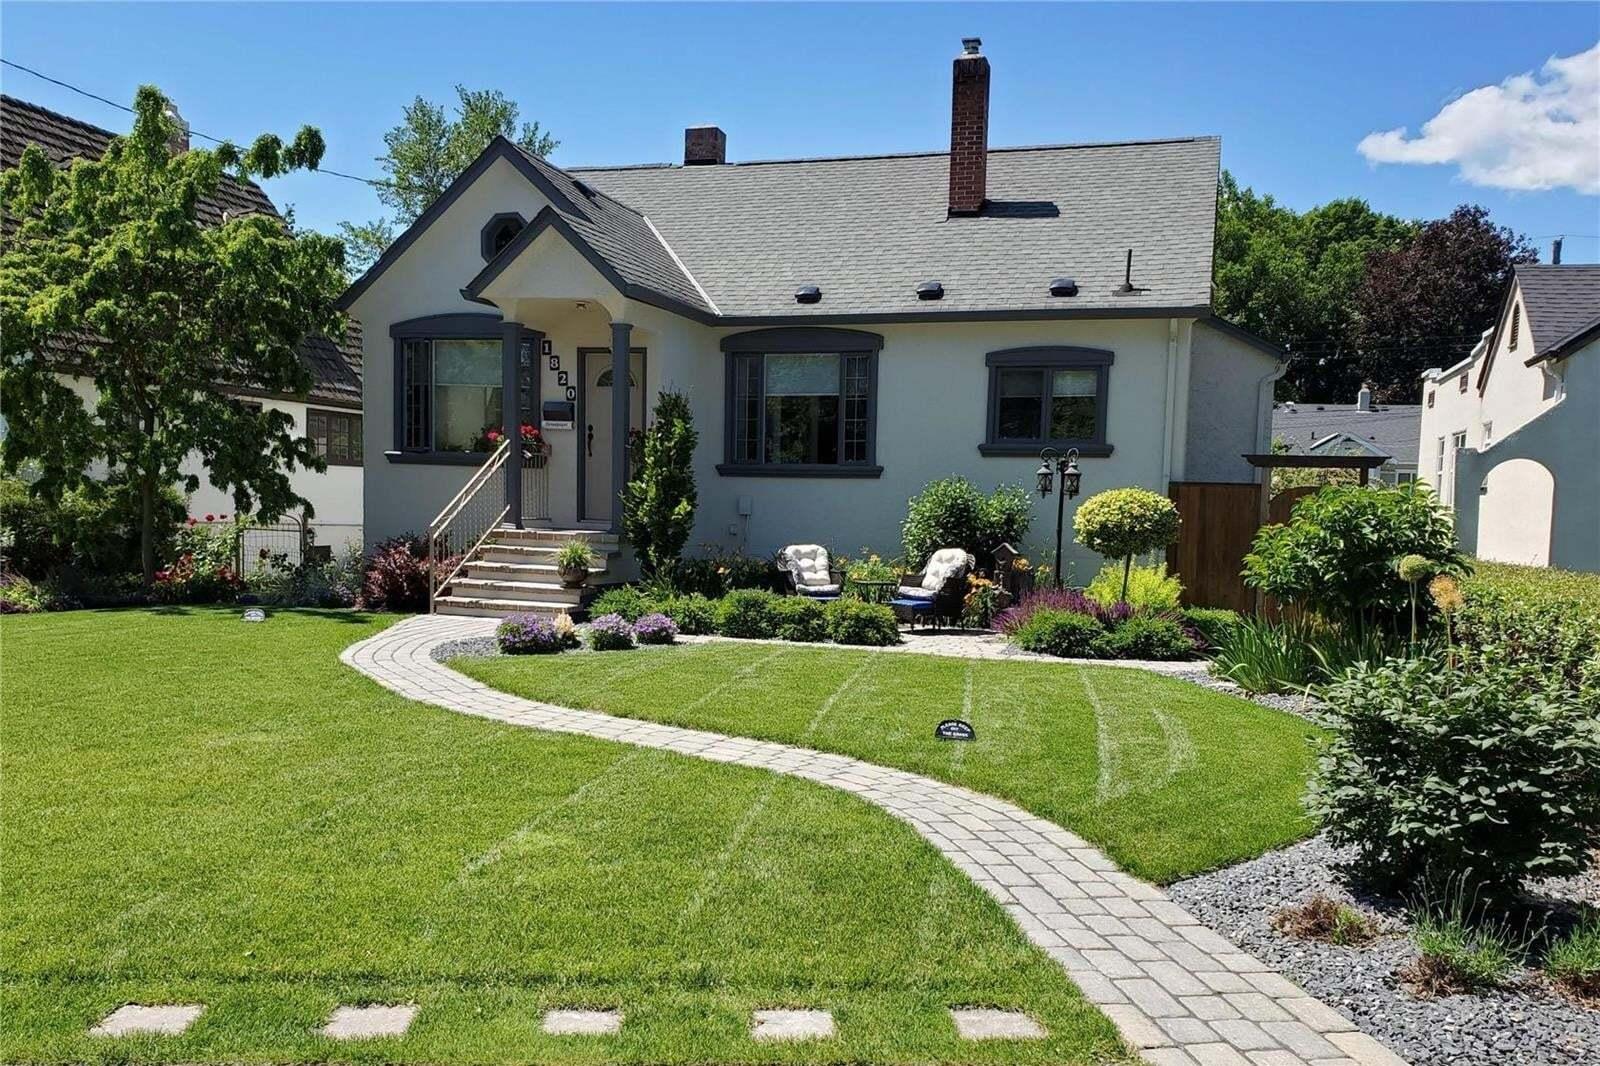 House for sale at 1820 Water St Kelowna British Columbia - MLS: 10196264